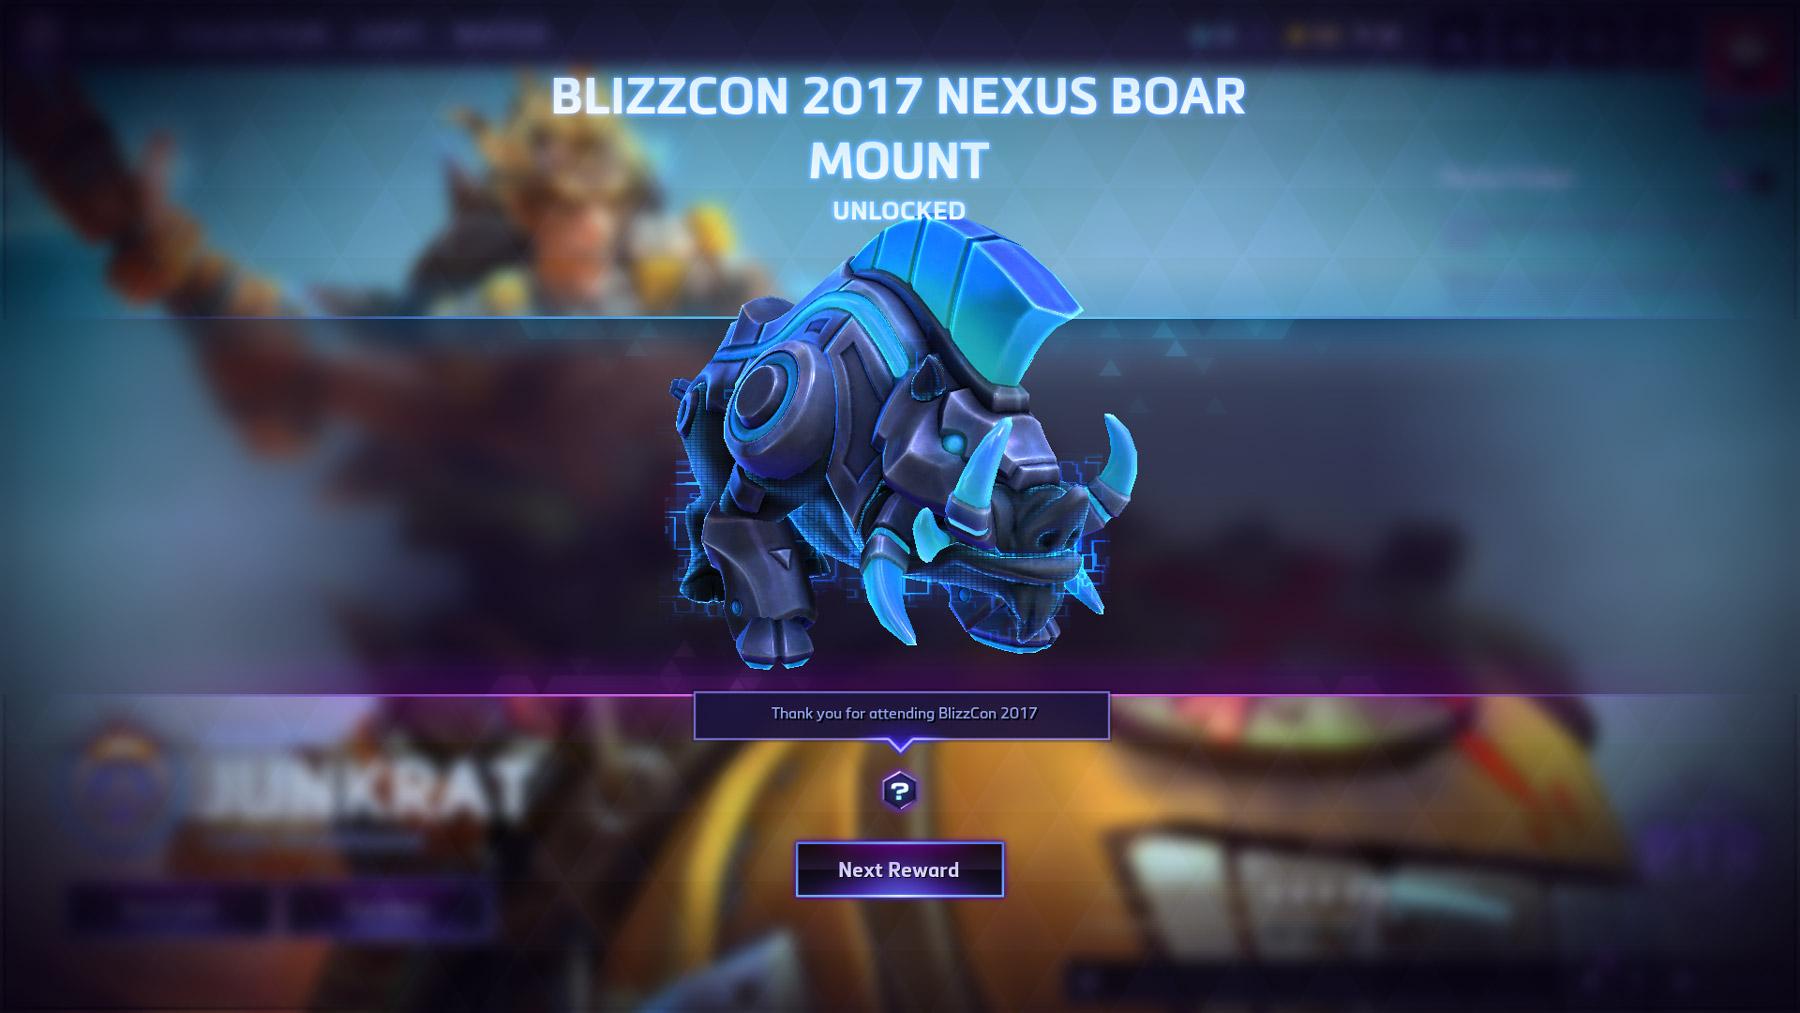 Bonus du billet virtuel de la Blizzcon 2017 : la monture Tranchedos